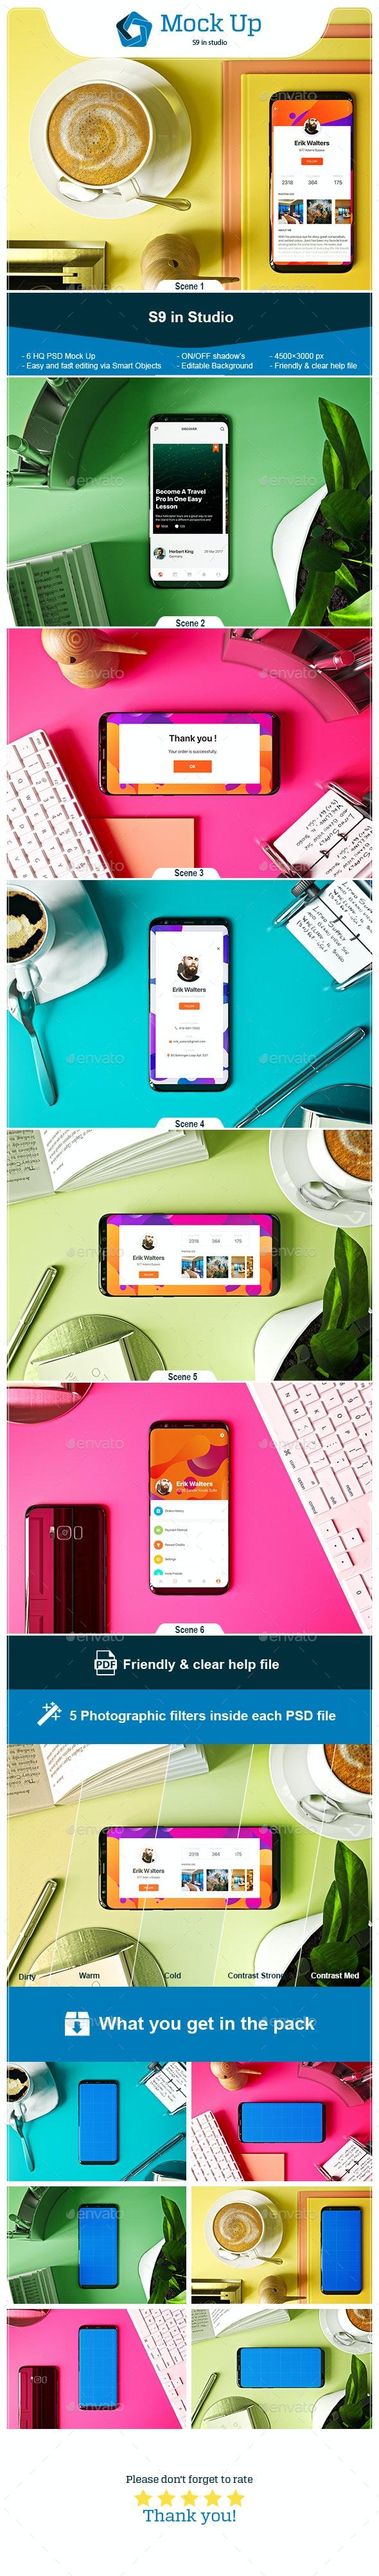 S9 in Studio Mock-up - Mobile Displays